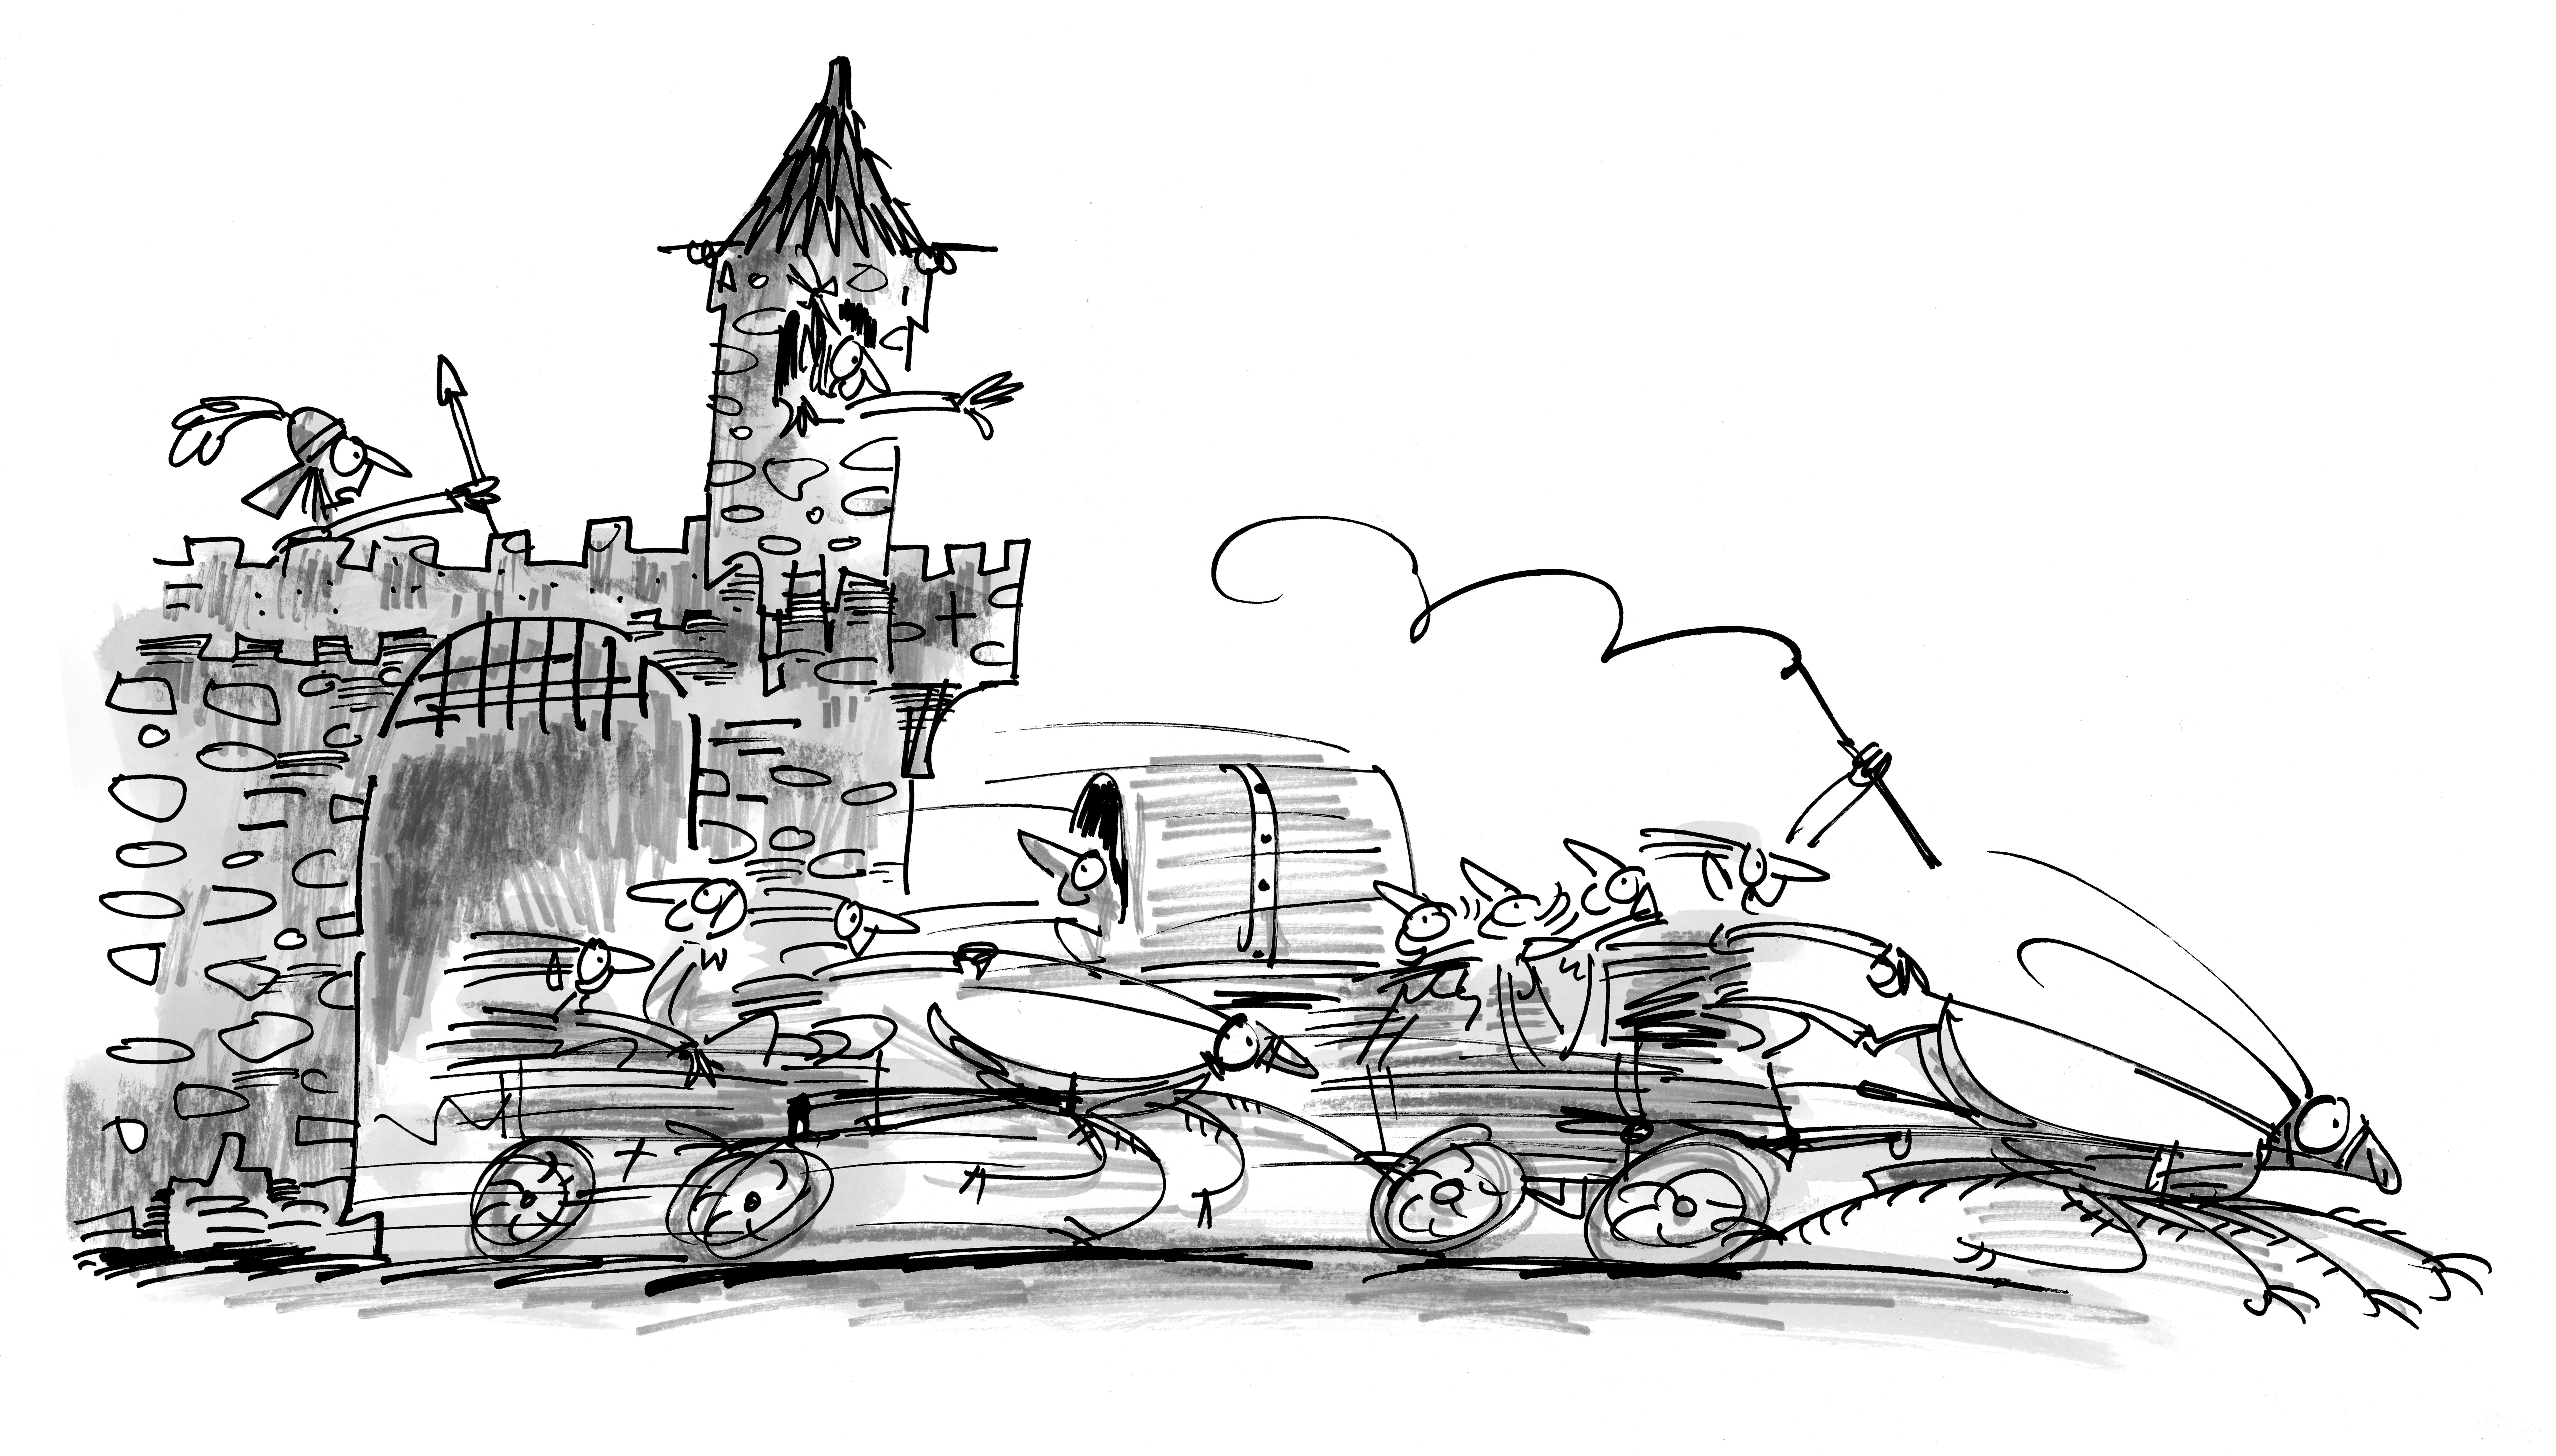 Problem opening castle story - Storm8 Community Forums